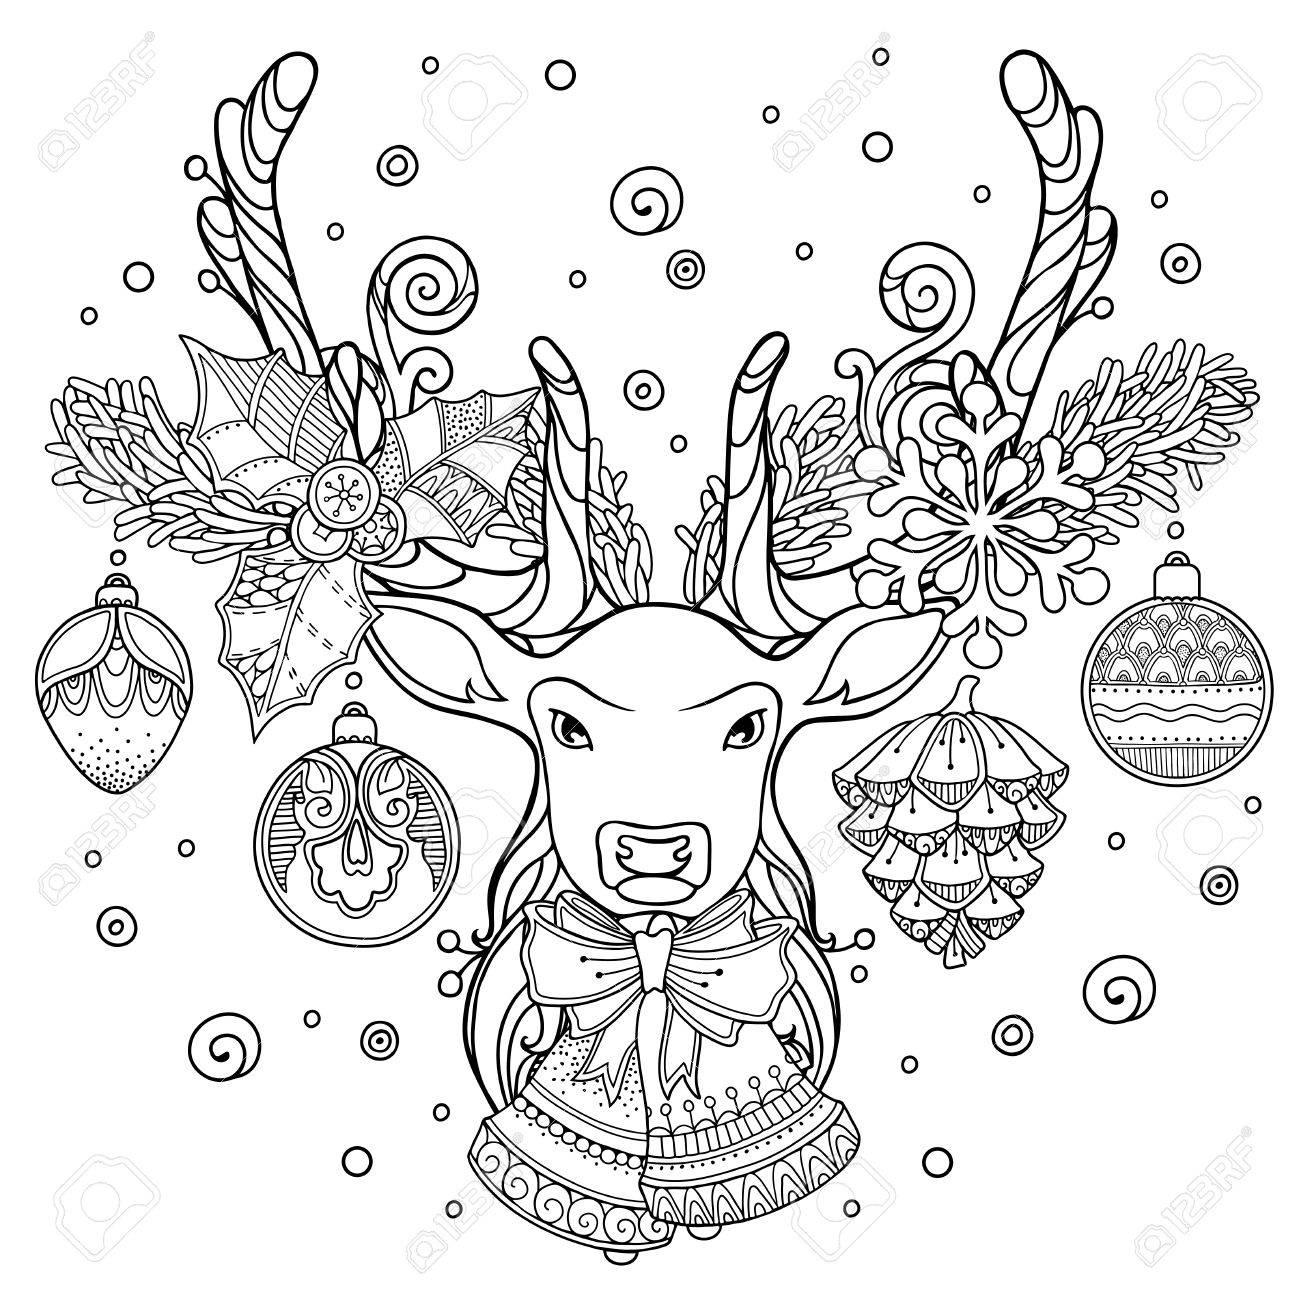 Dibujos Originales Navidad Excellent Stunning Belenes Recortables - Dibujos-originales-de-navidad